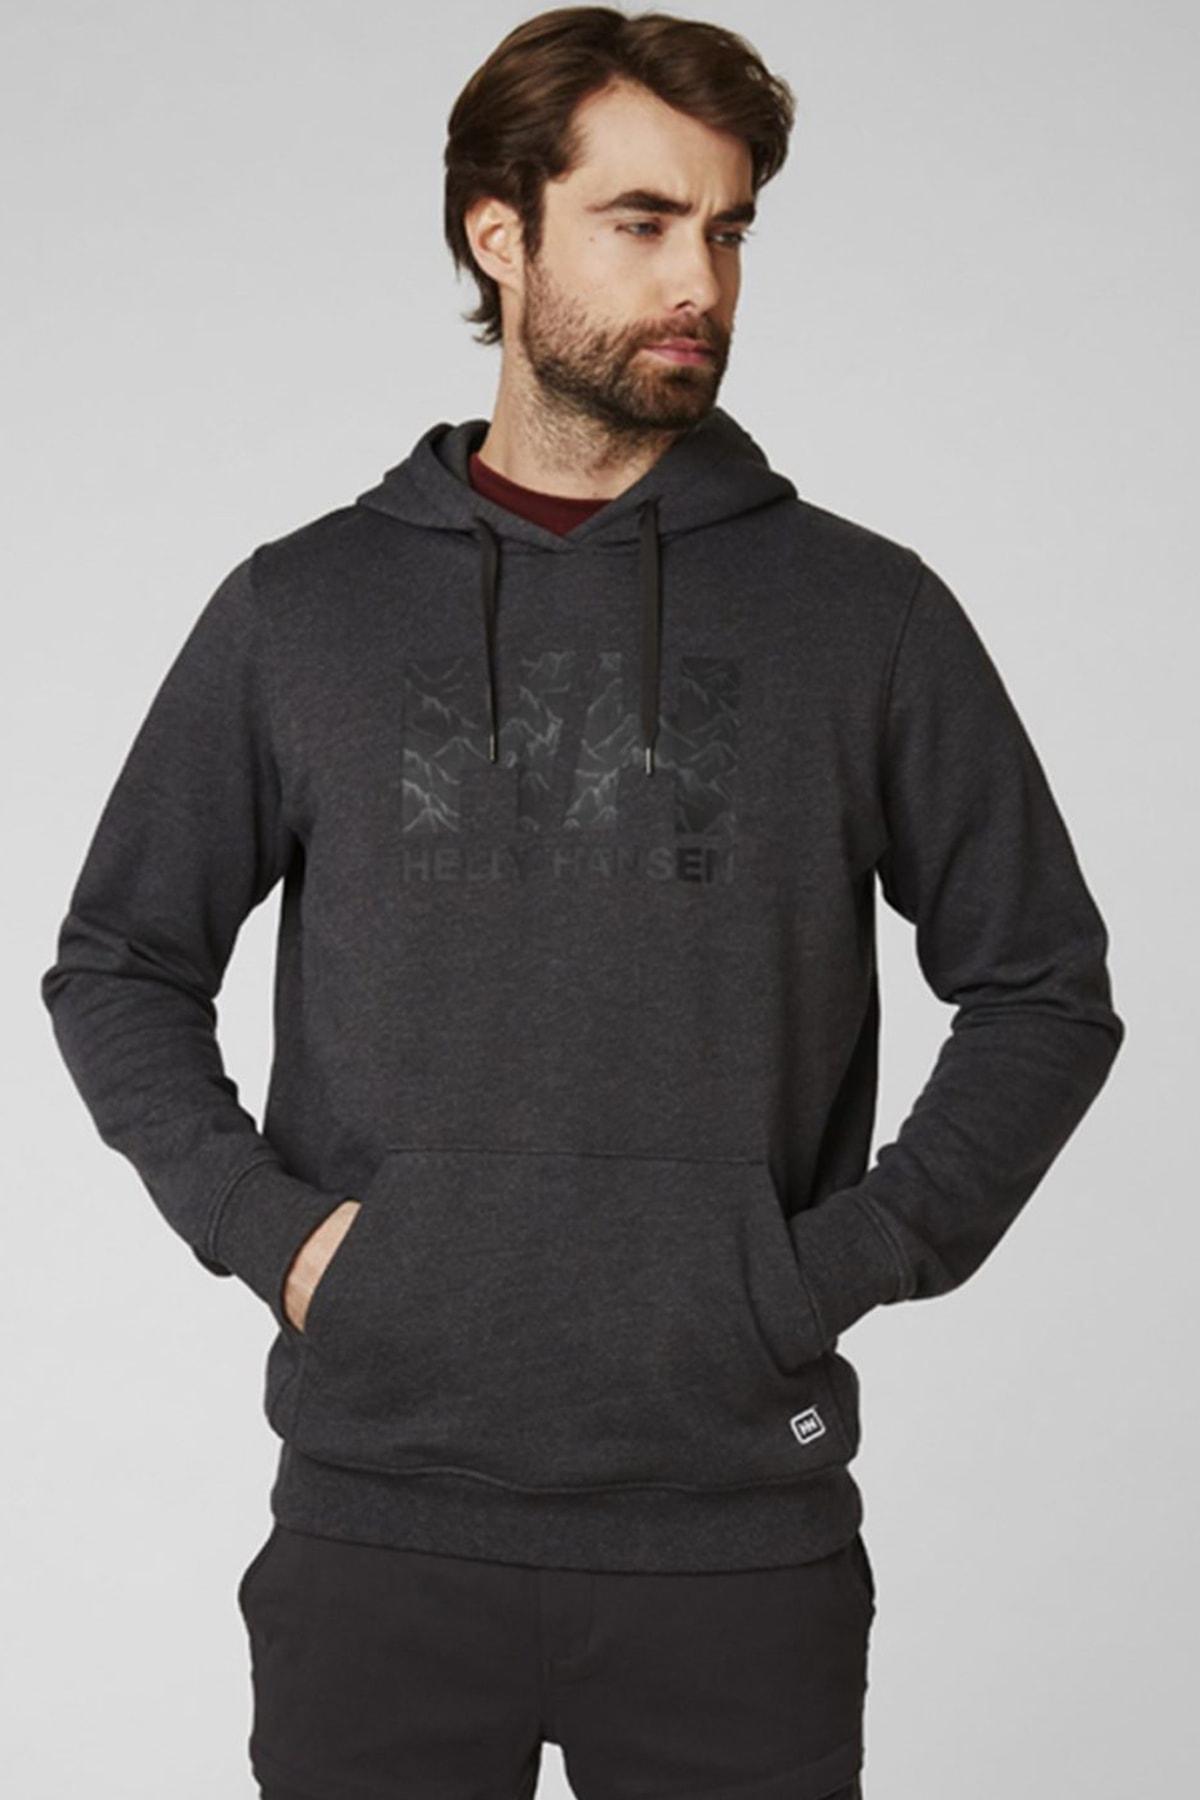 Helly Hansen F2F Cotton Hoodıe Sweatshirt HHA.62934 2